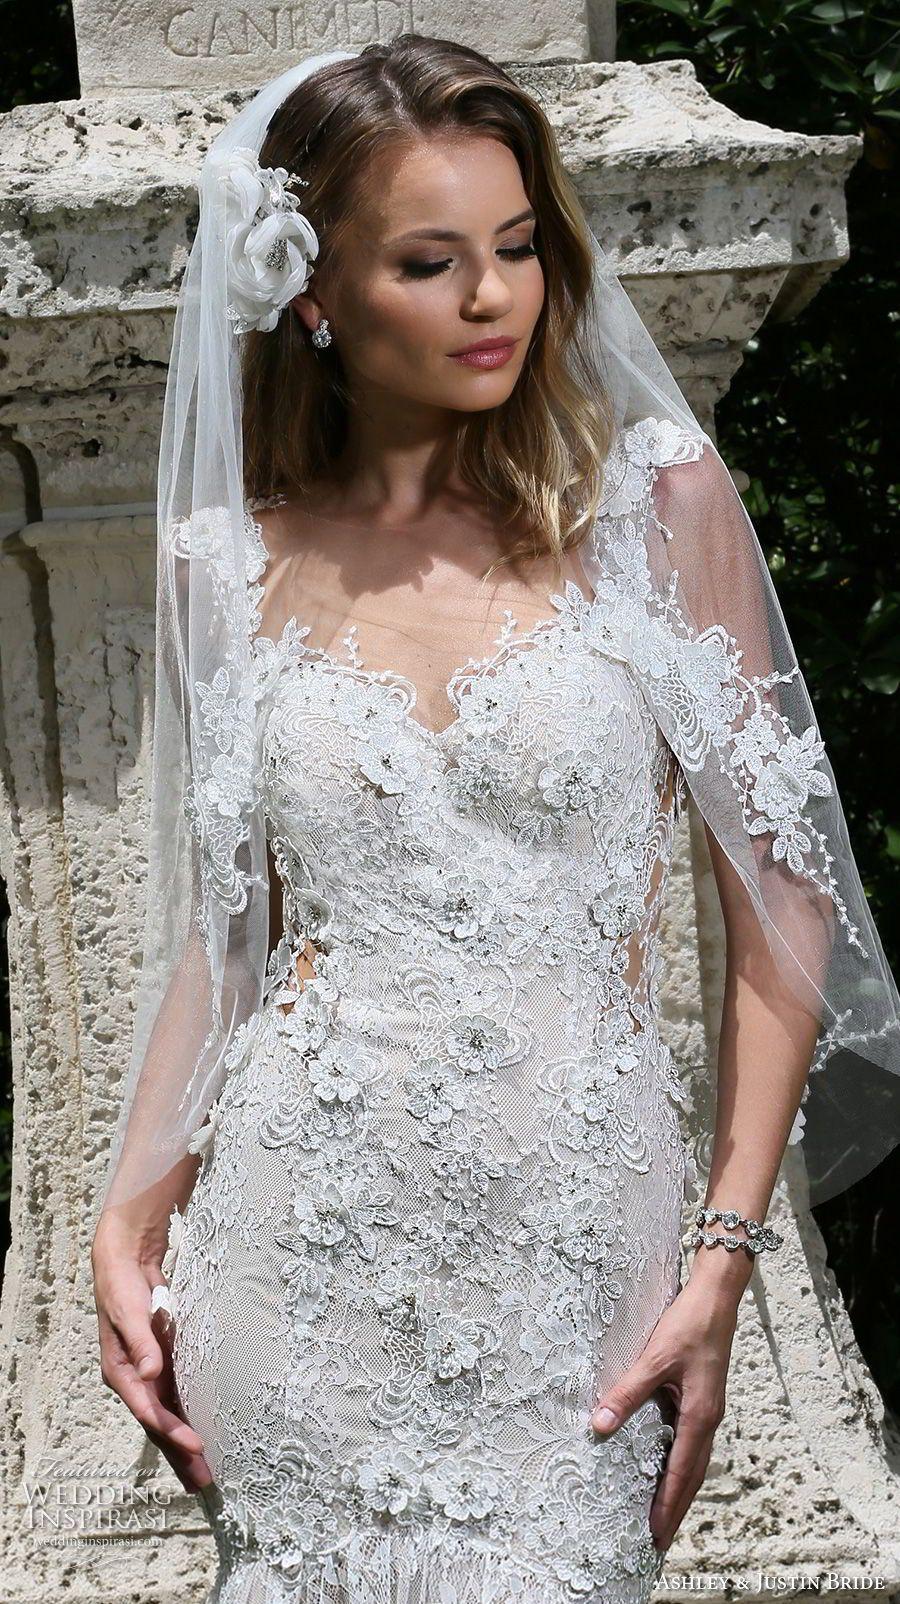 ashley justin frühling 2018 bridal cap ärmeln schatzausschnitt volle ...